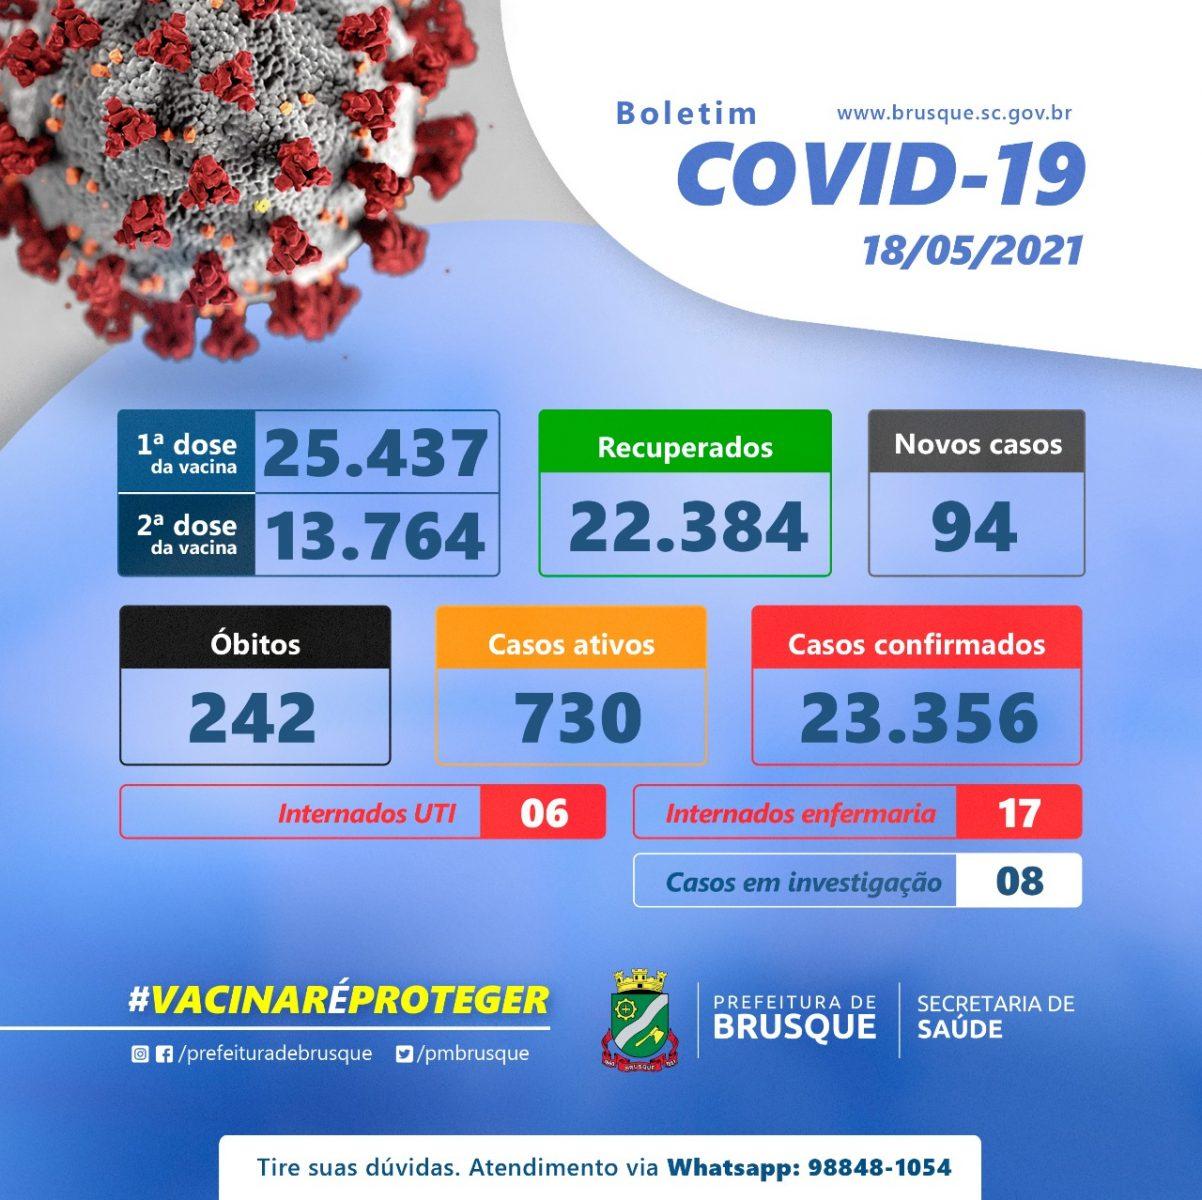 Covid-19: Confira o boletim epidemiológico desta terça-feira (18)